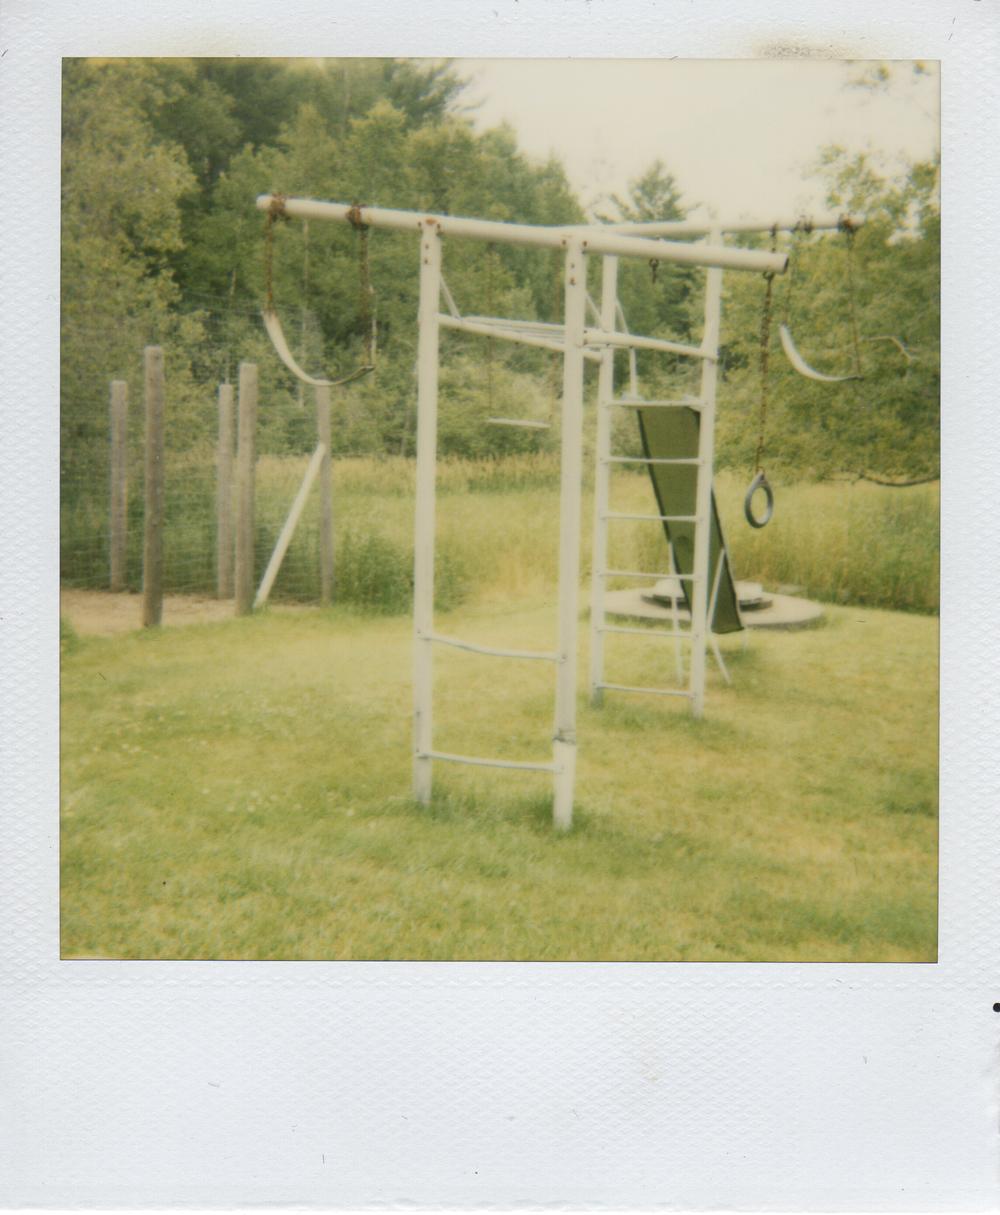 jlaurence-polaroid-014.jpg